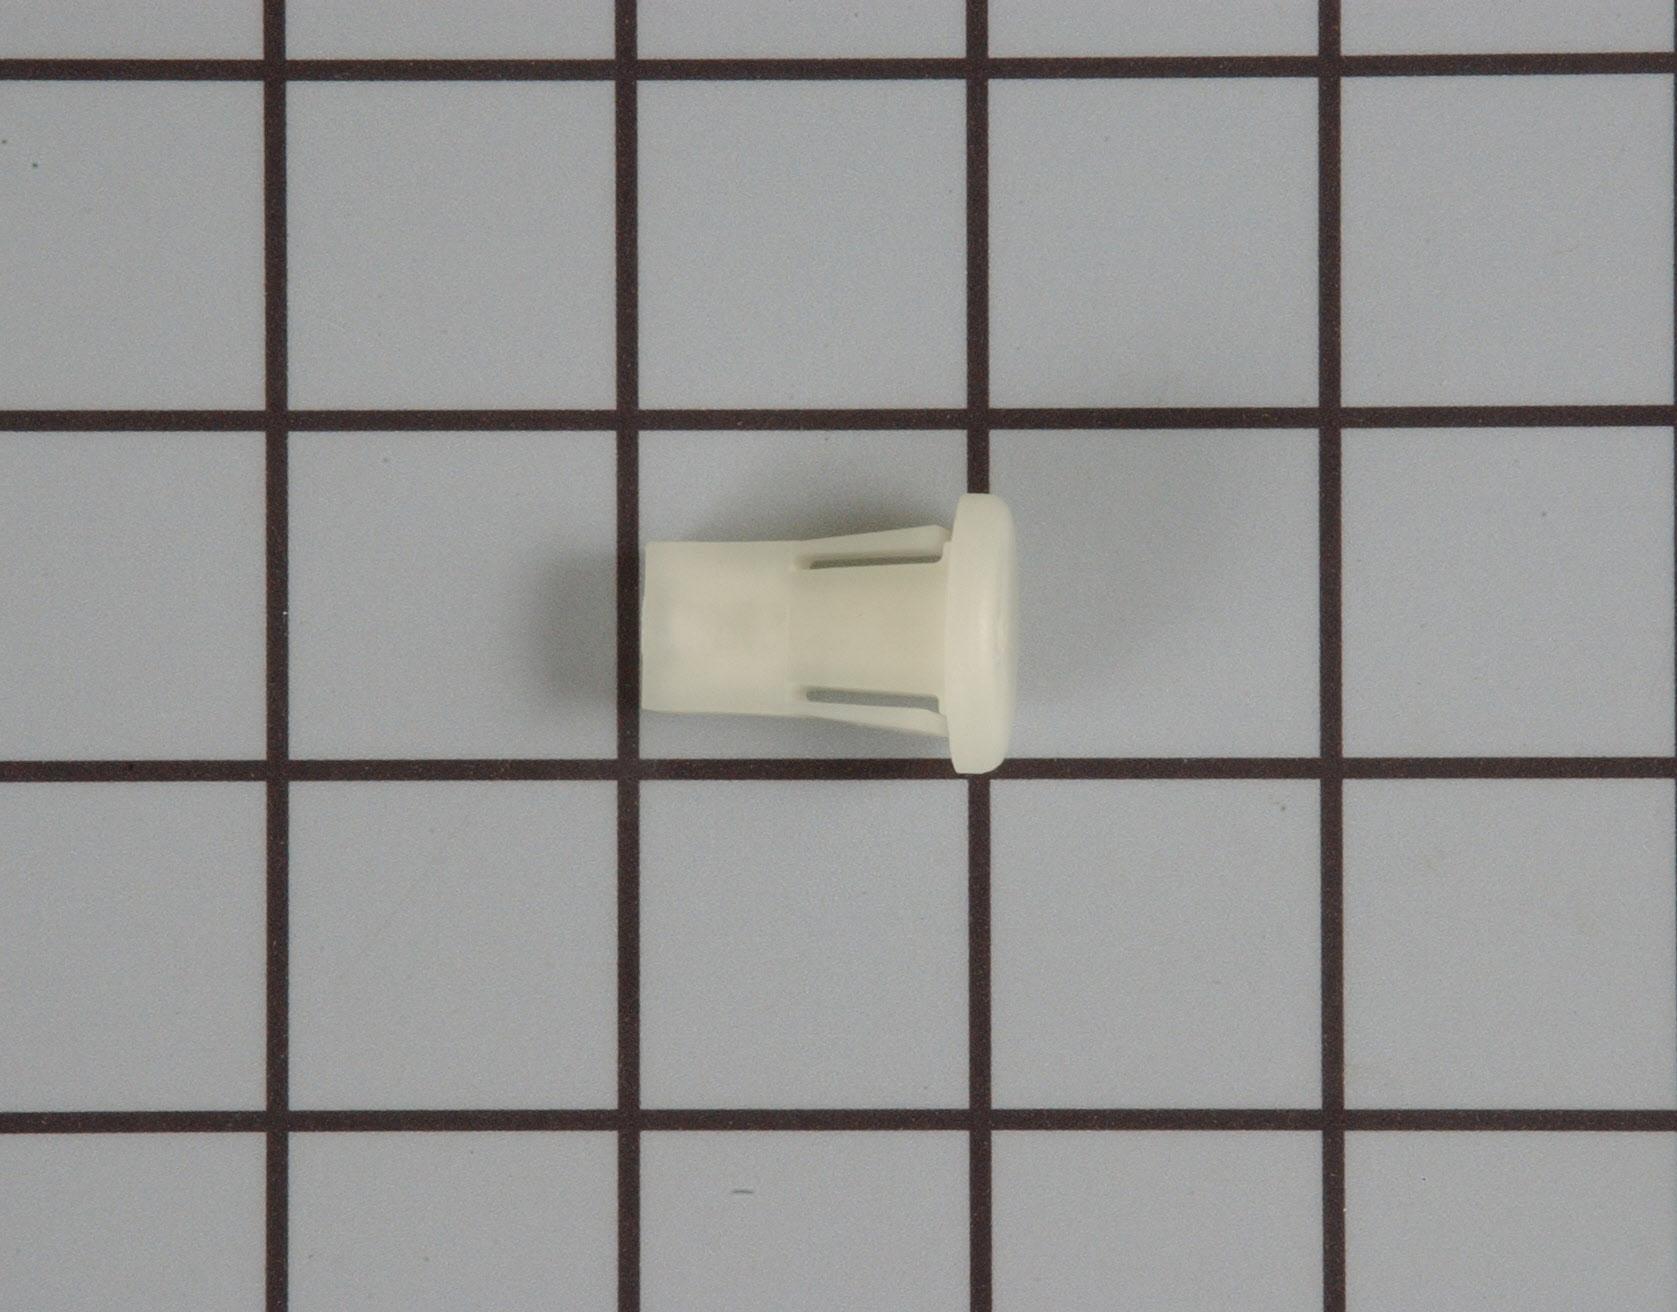 22001999 Crosley Washing Machine Part -Grommet